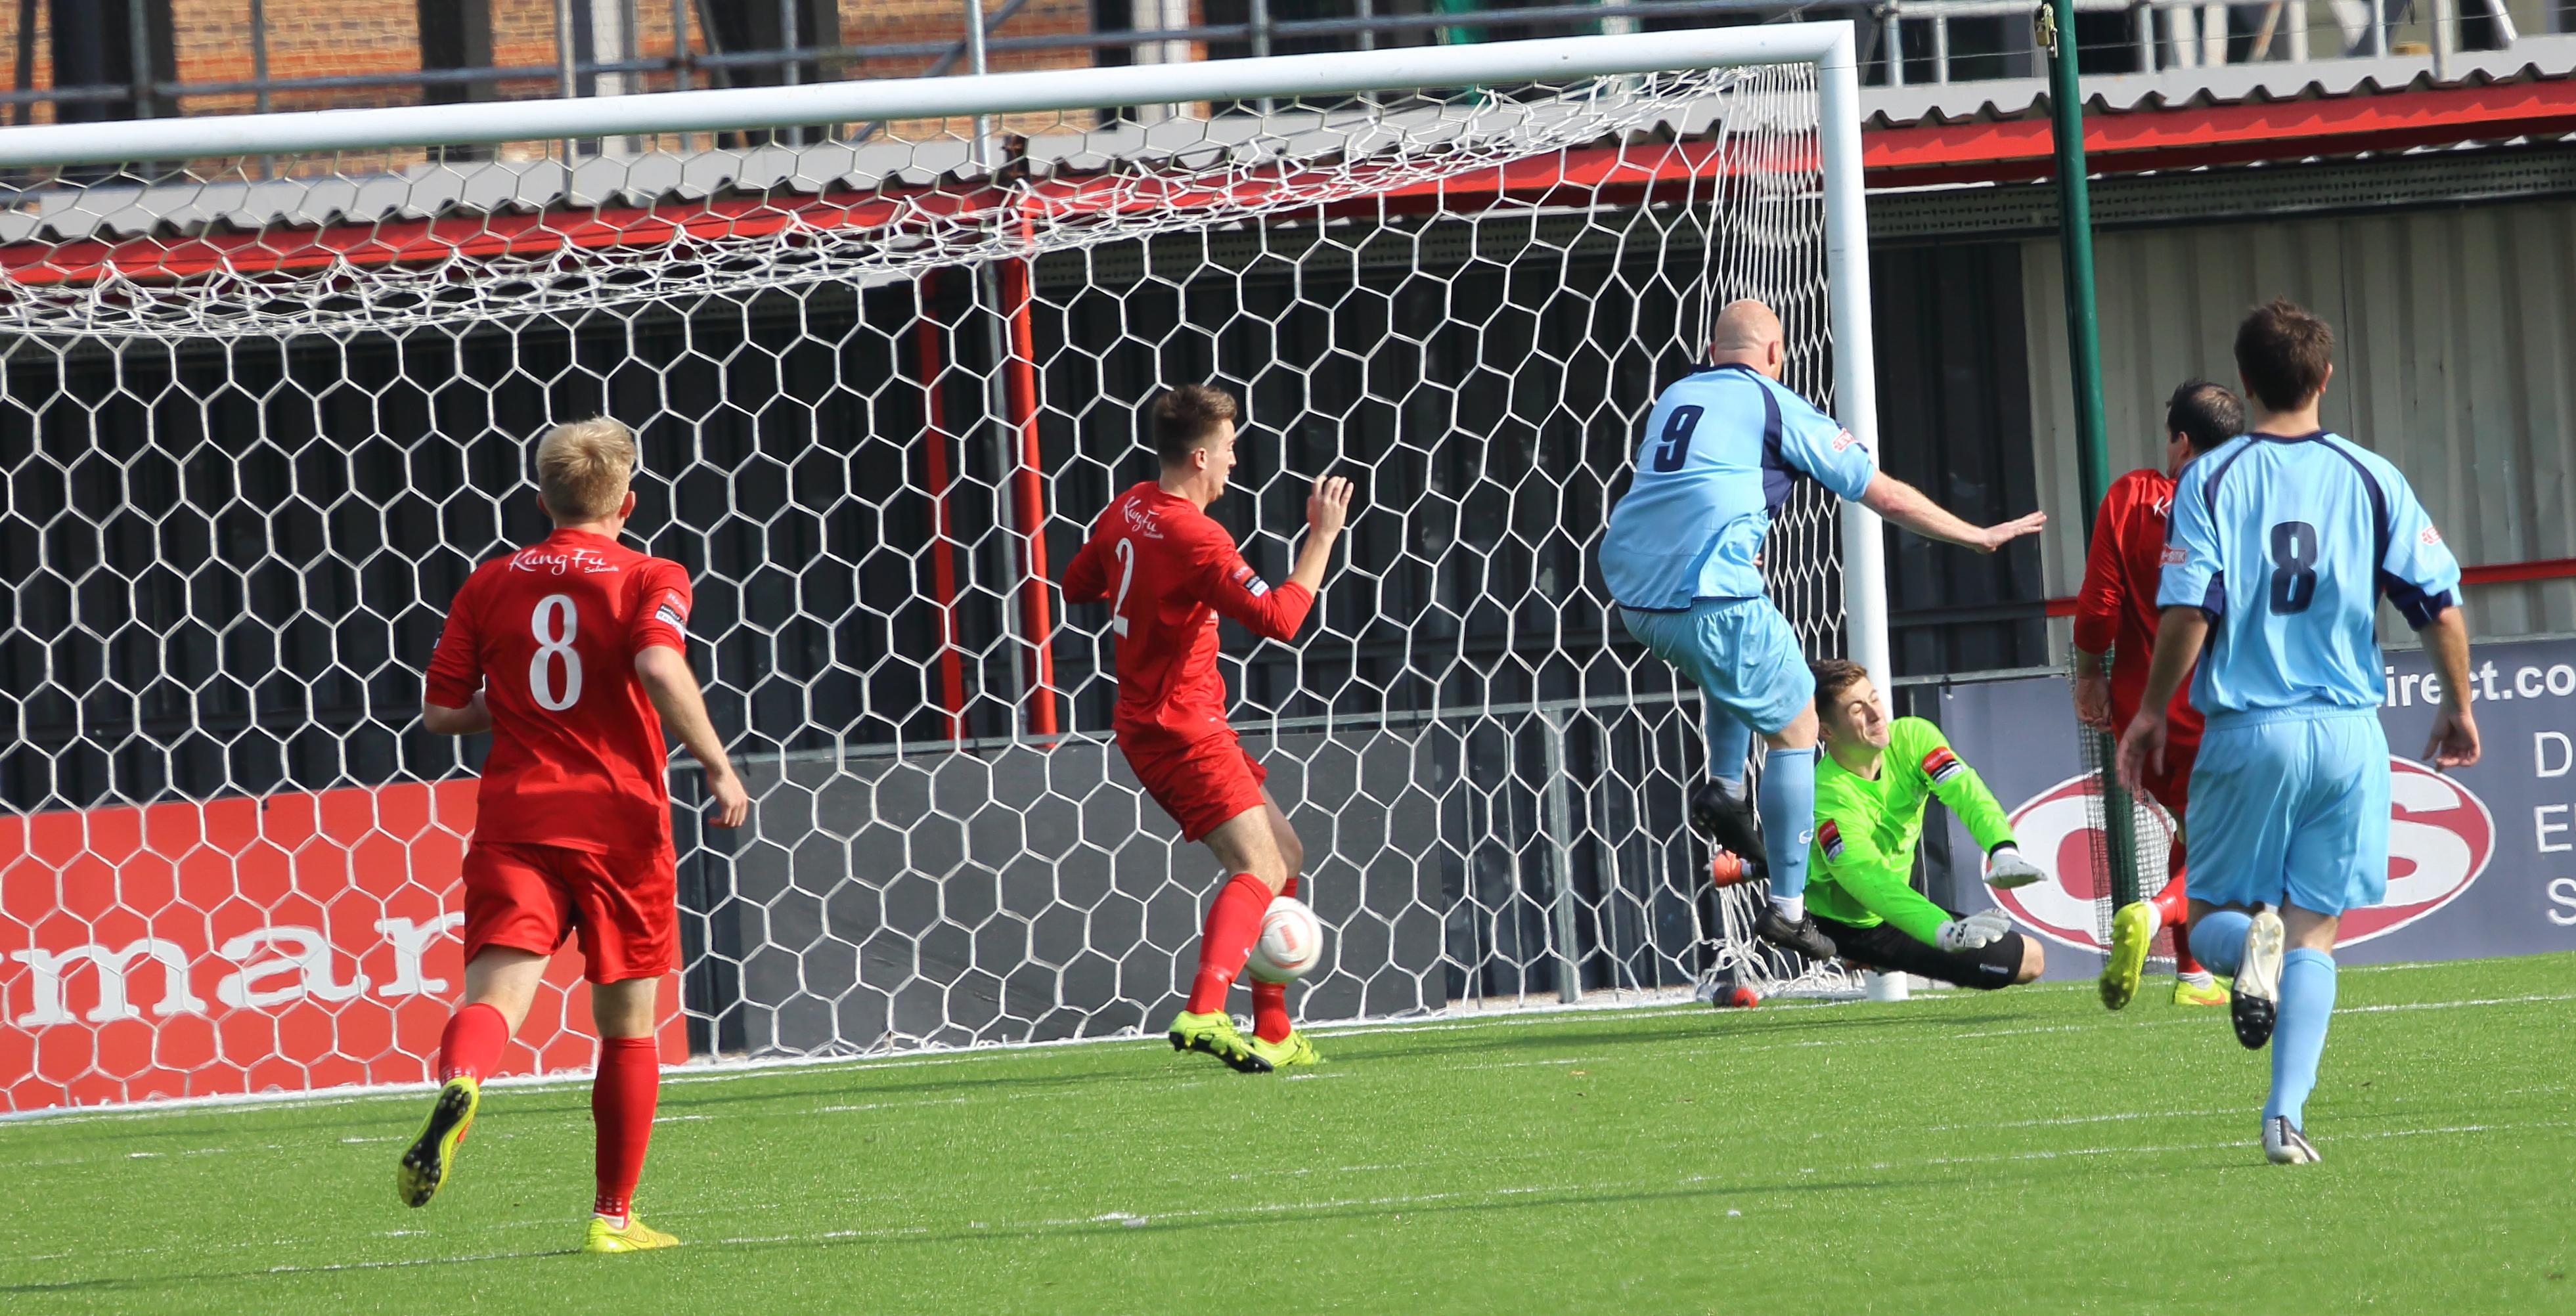 An unfortunate own goal Carshalton v Leighton  by Bobby Price